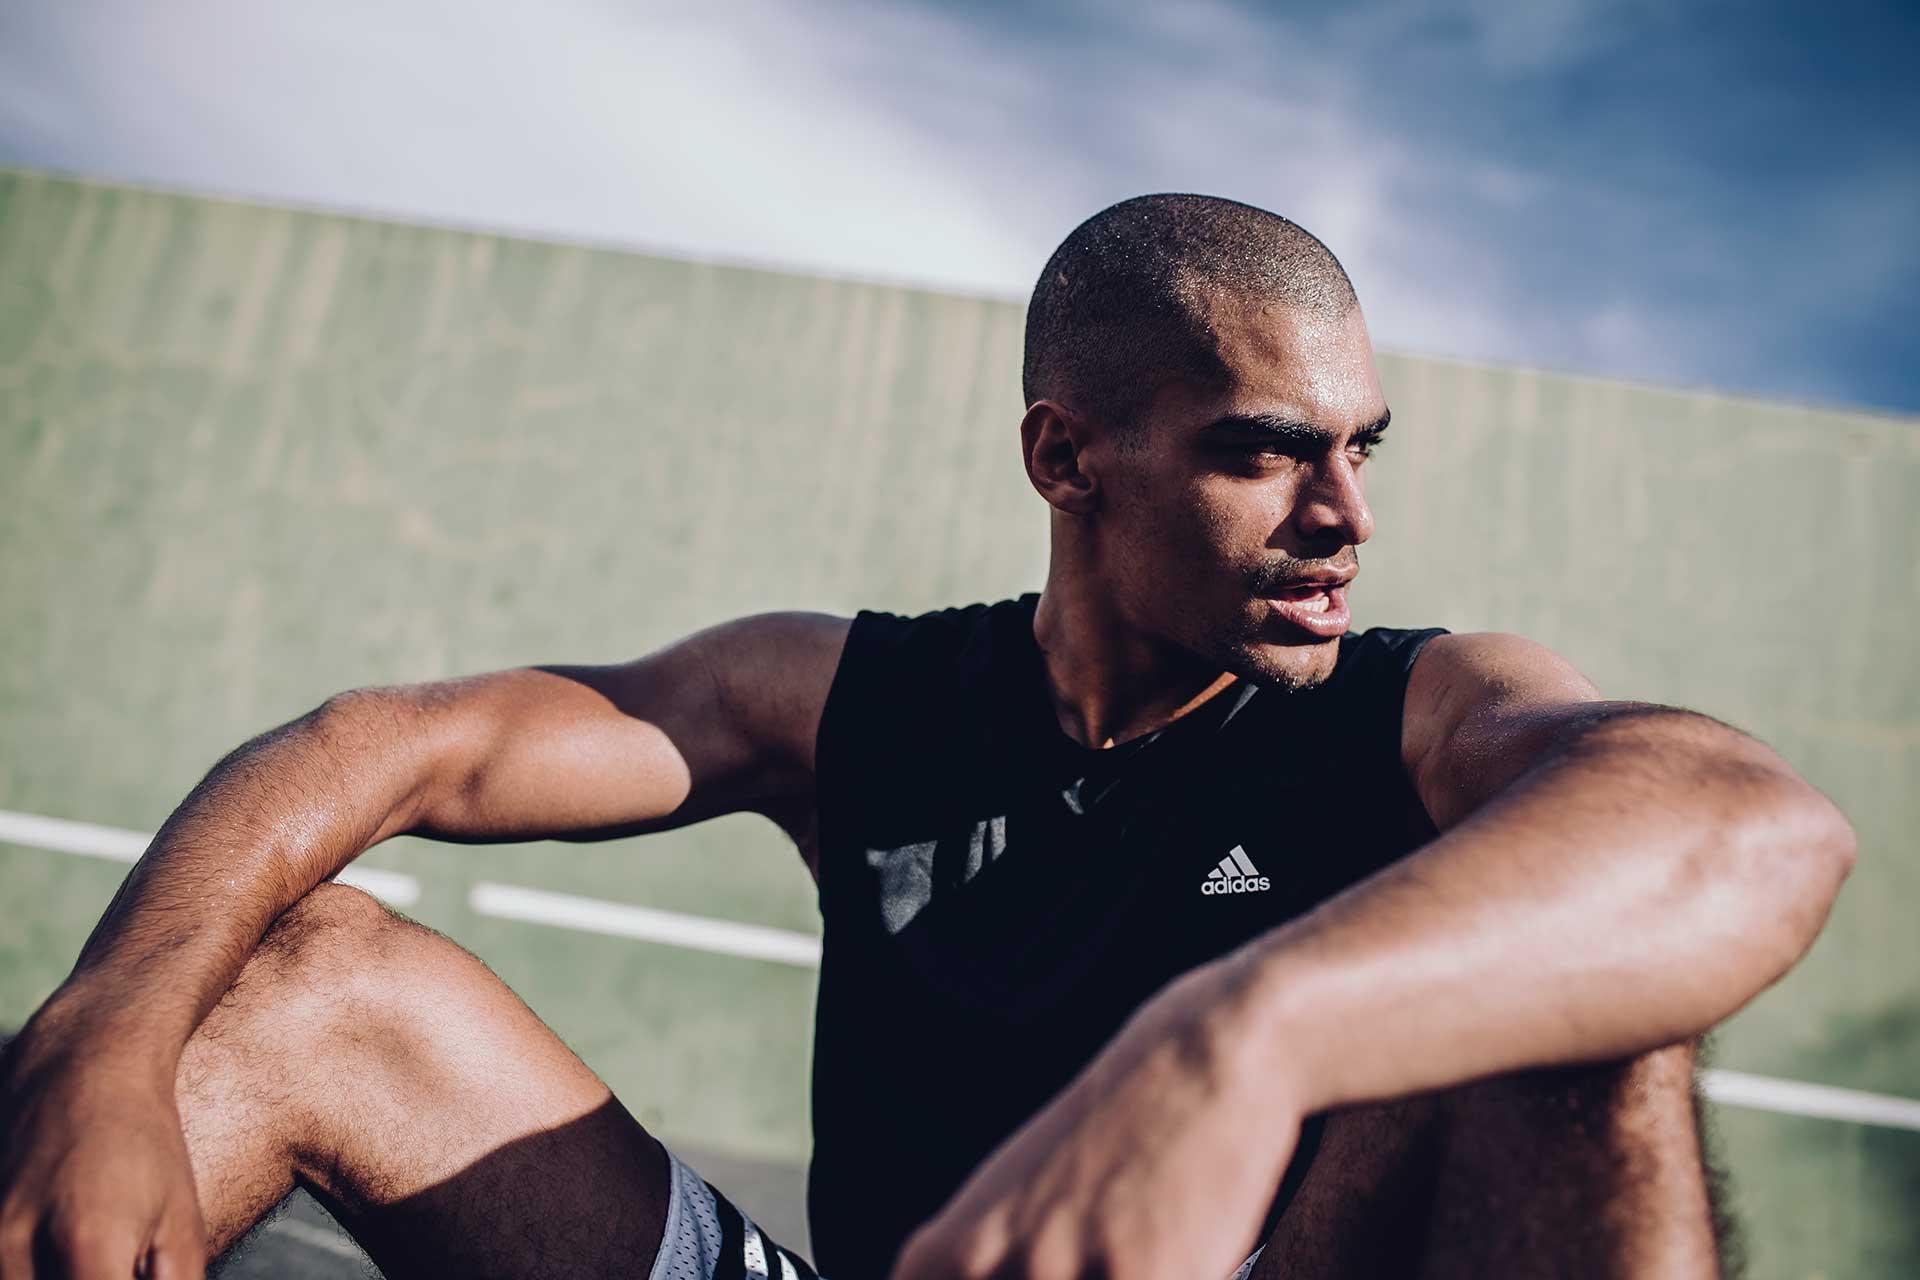 Fotograf People Lifestyle Sport Porträt Südafrika Kapstadt